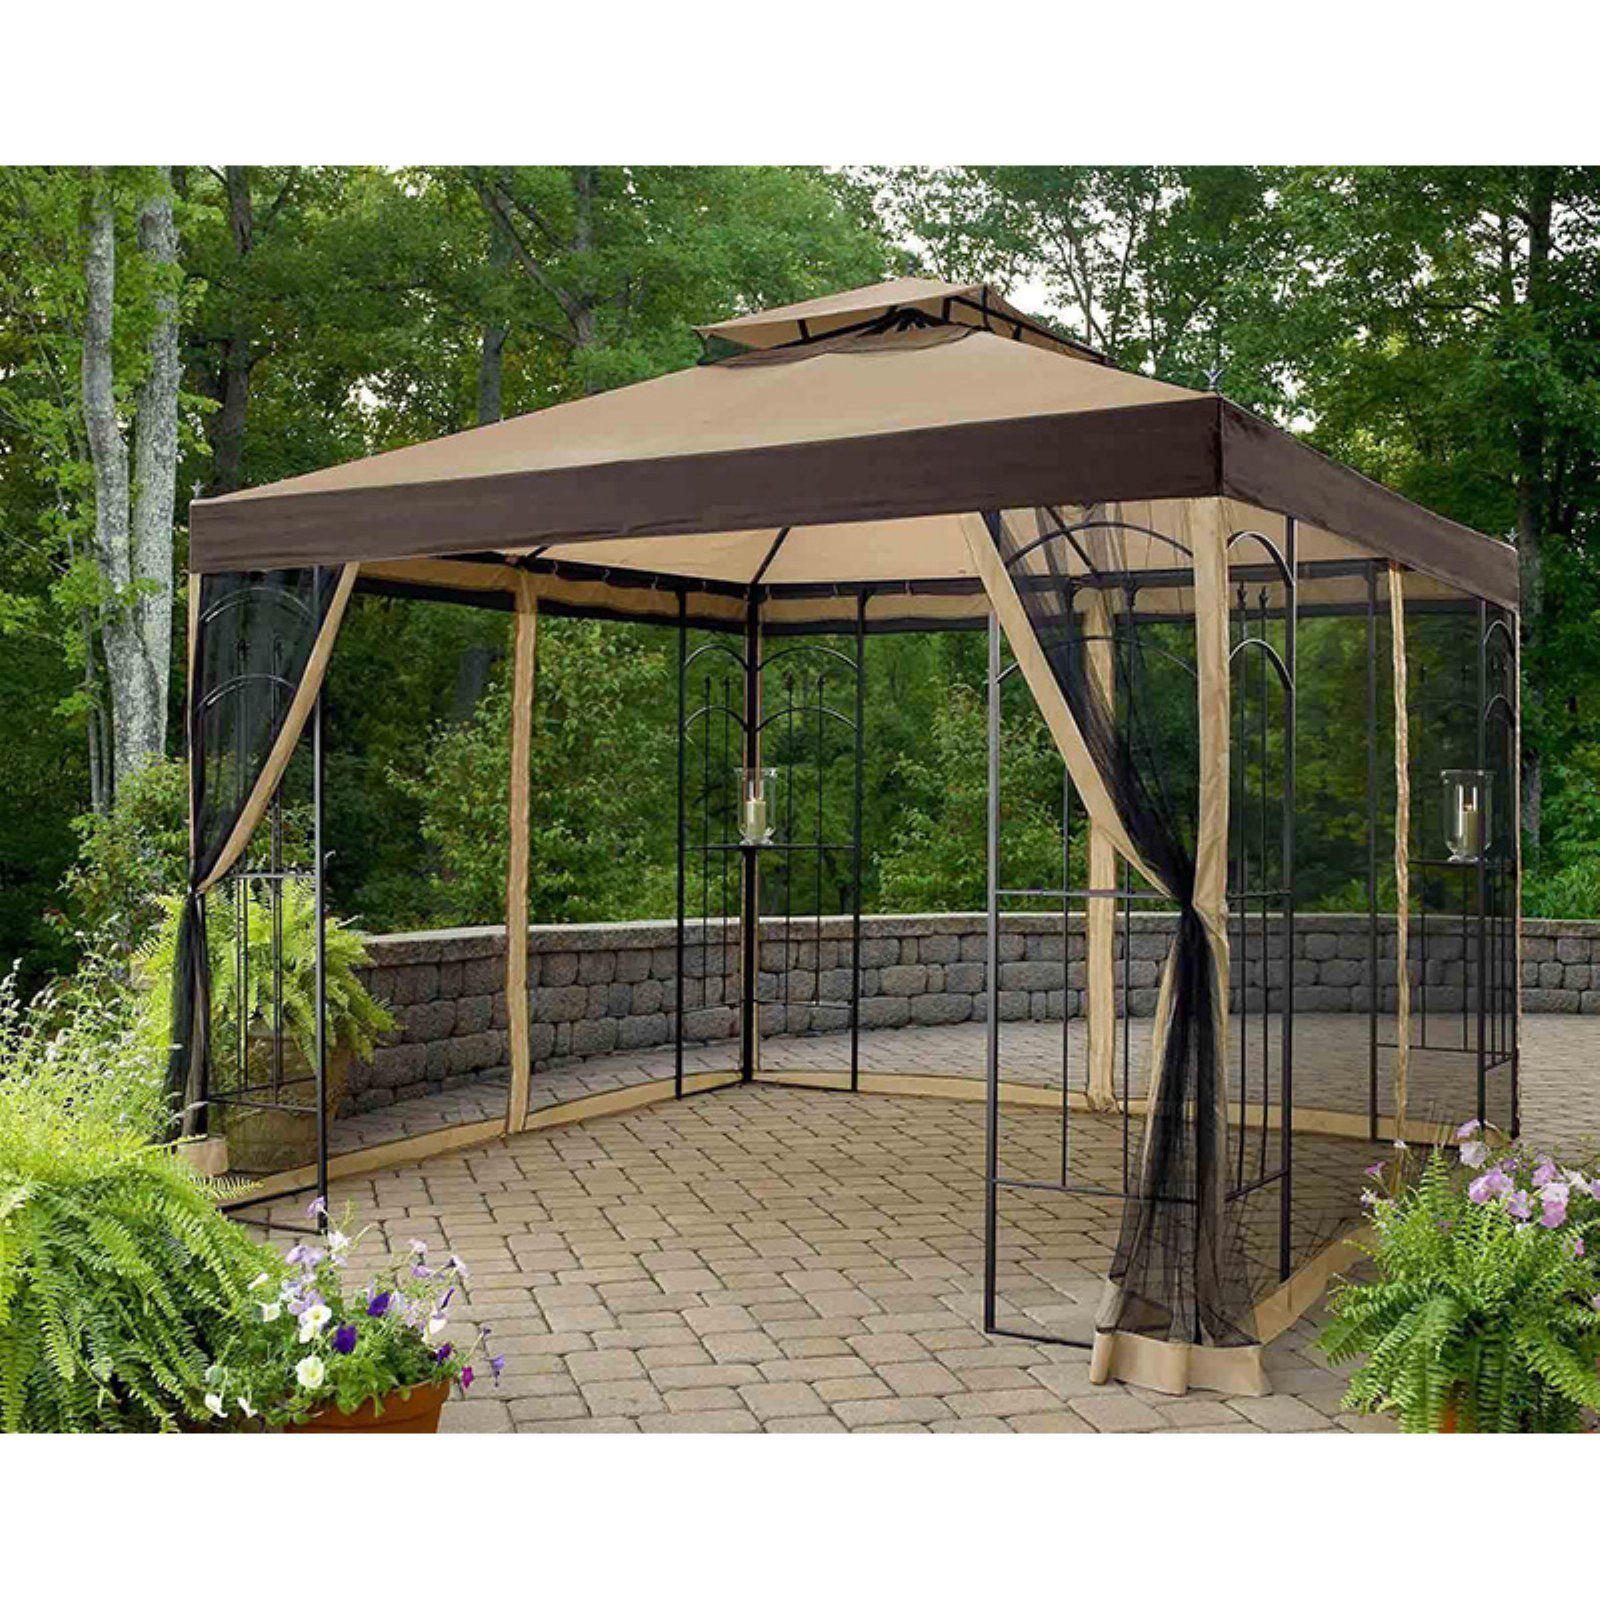 Sunjoy 10 X 10 Ft Replacement Canopy Cover For L Gz038pst 3a Winslow Gazebo Gazebo Canopy Gazebo